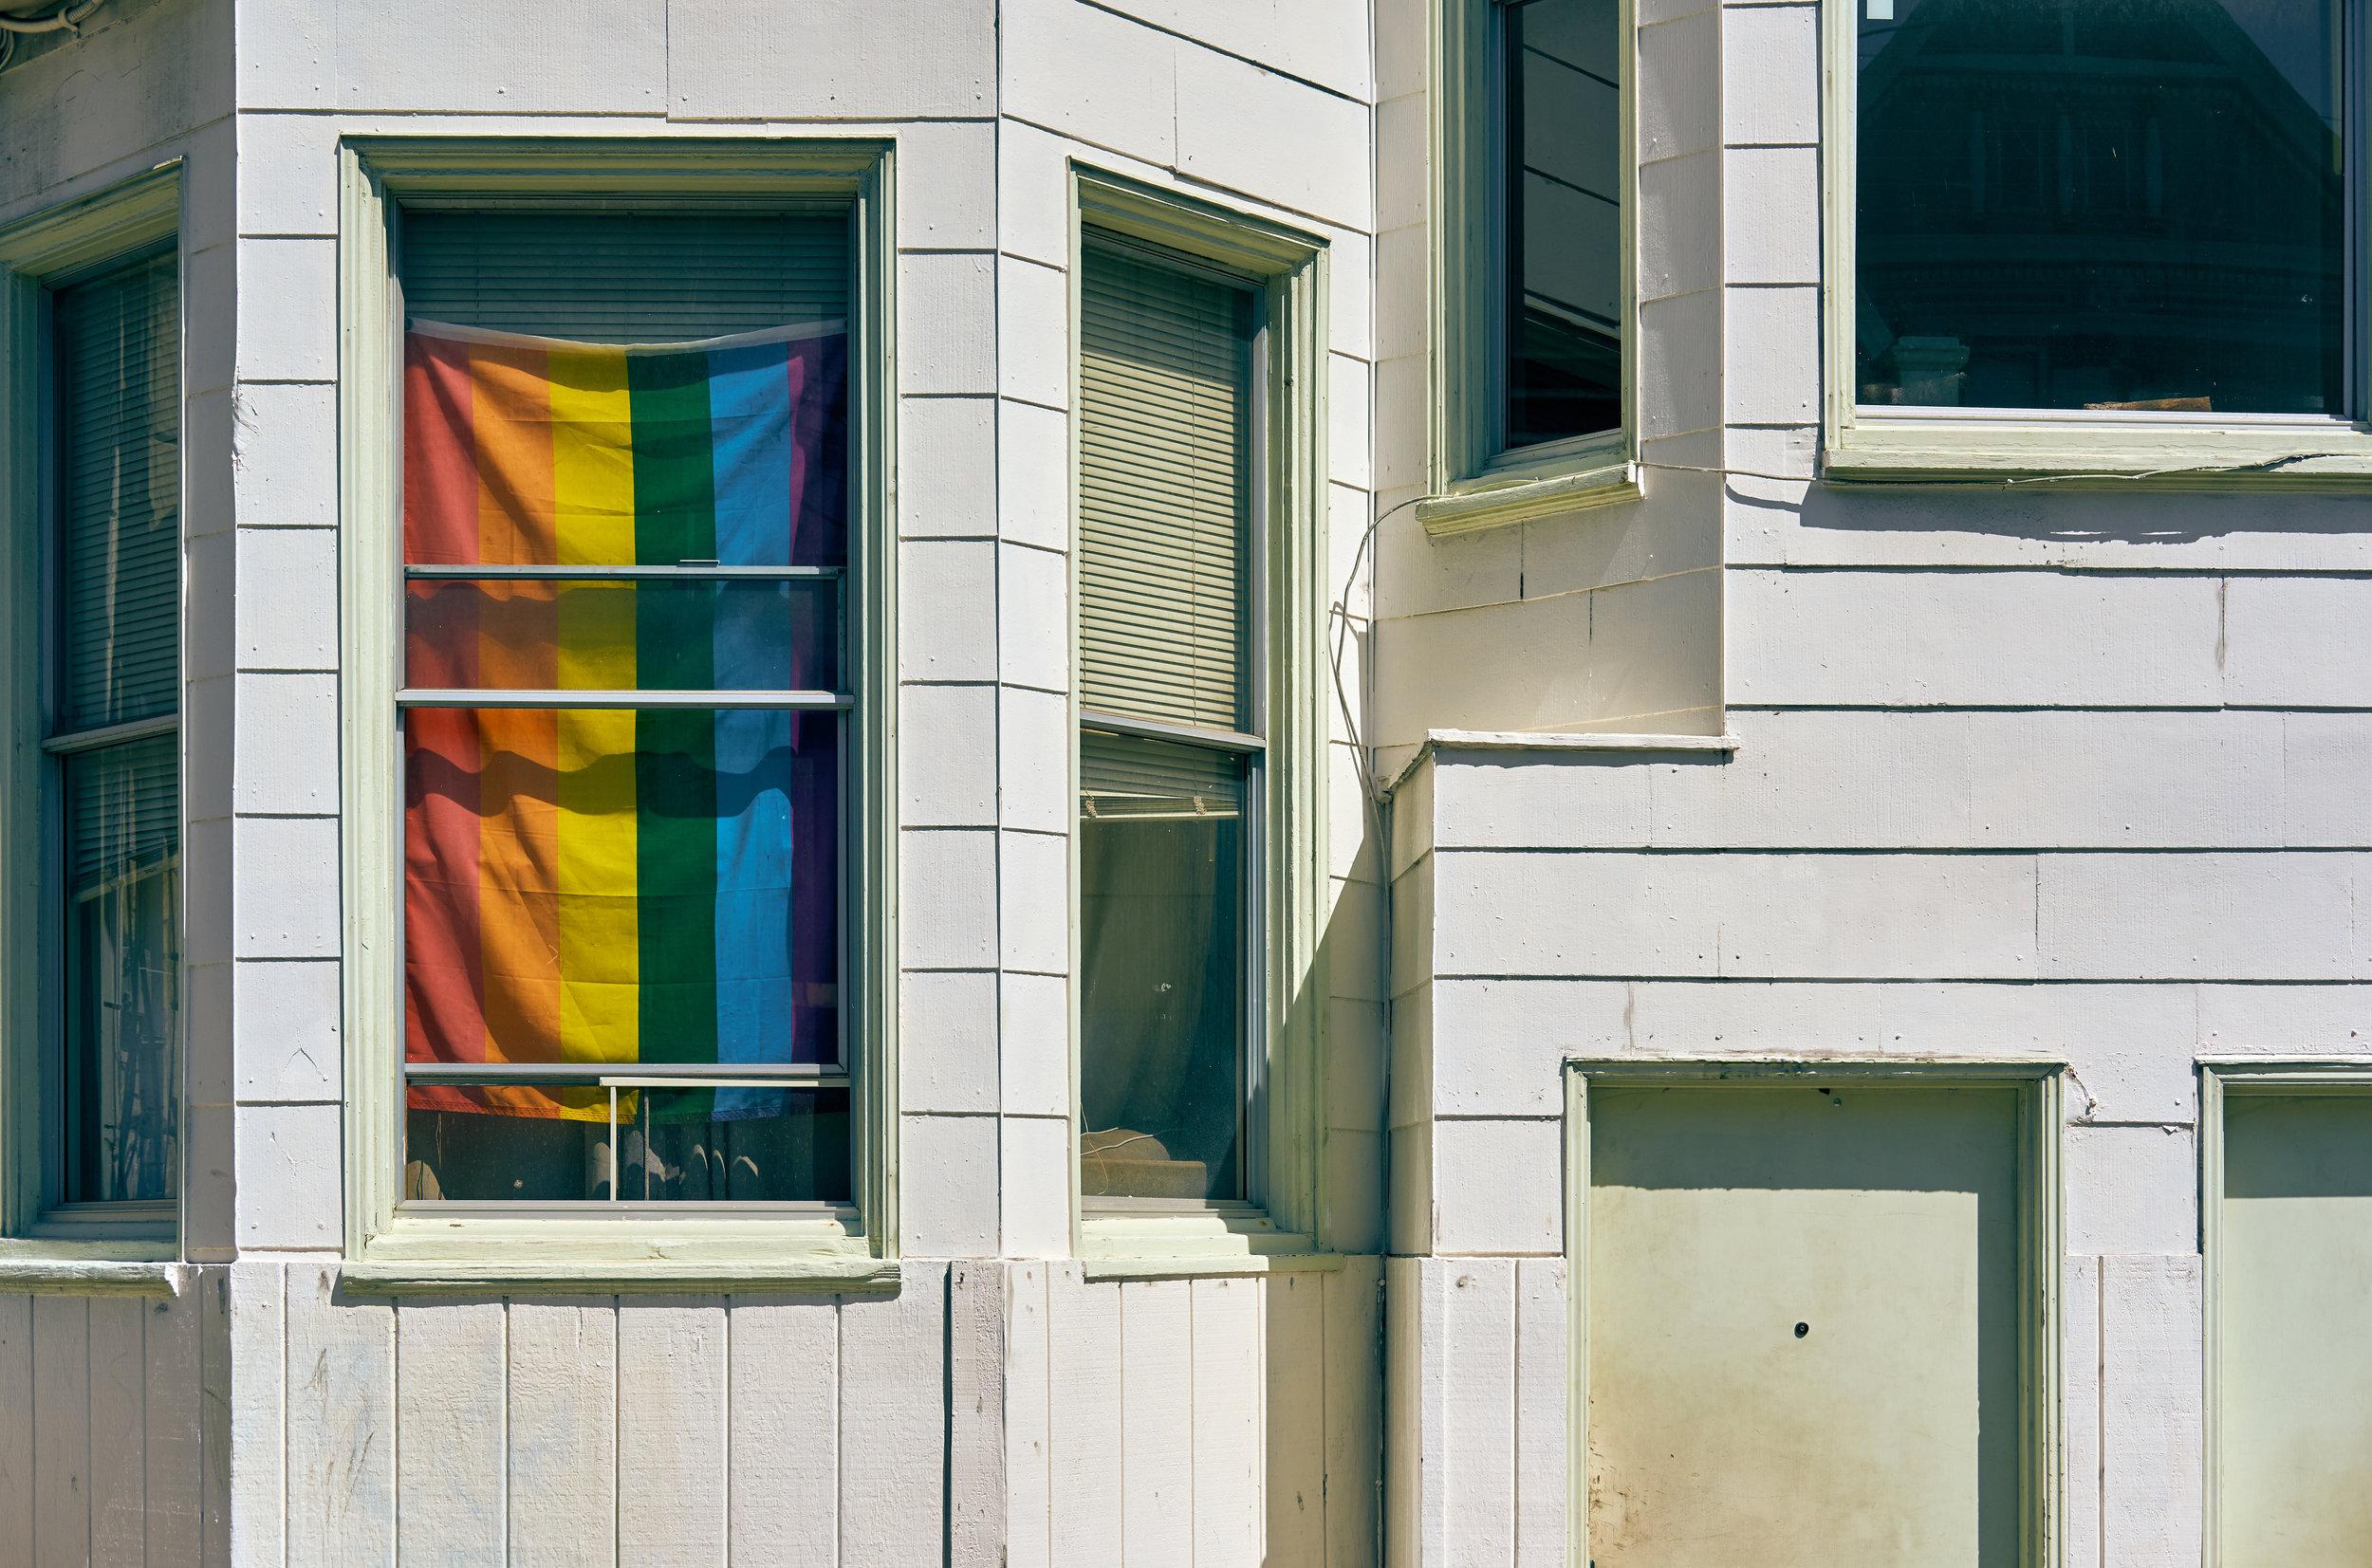 rainbow-flag-in-window-WKF9JAR.jpg